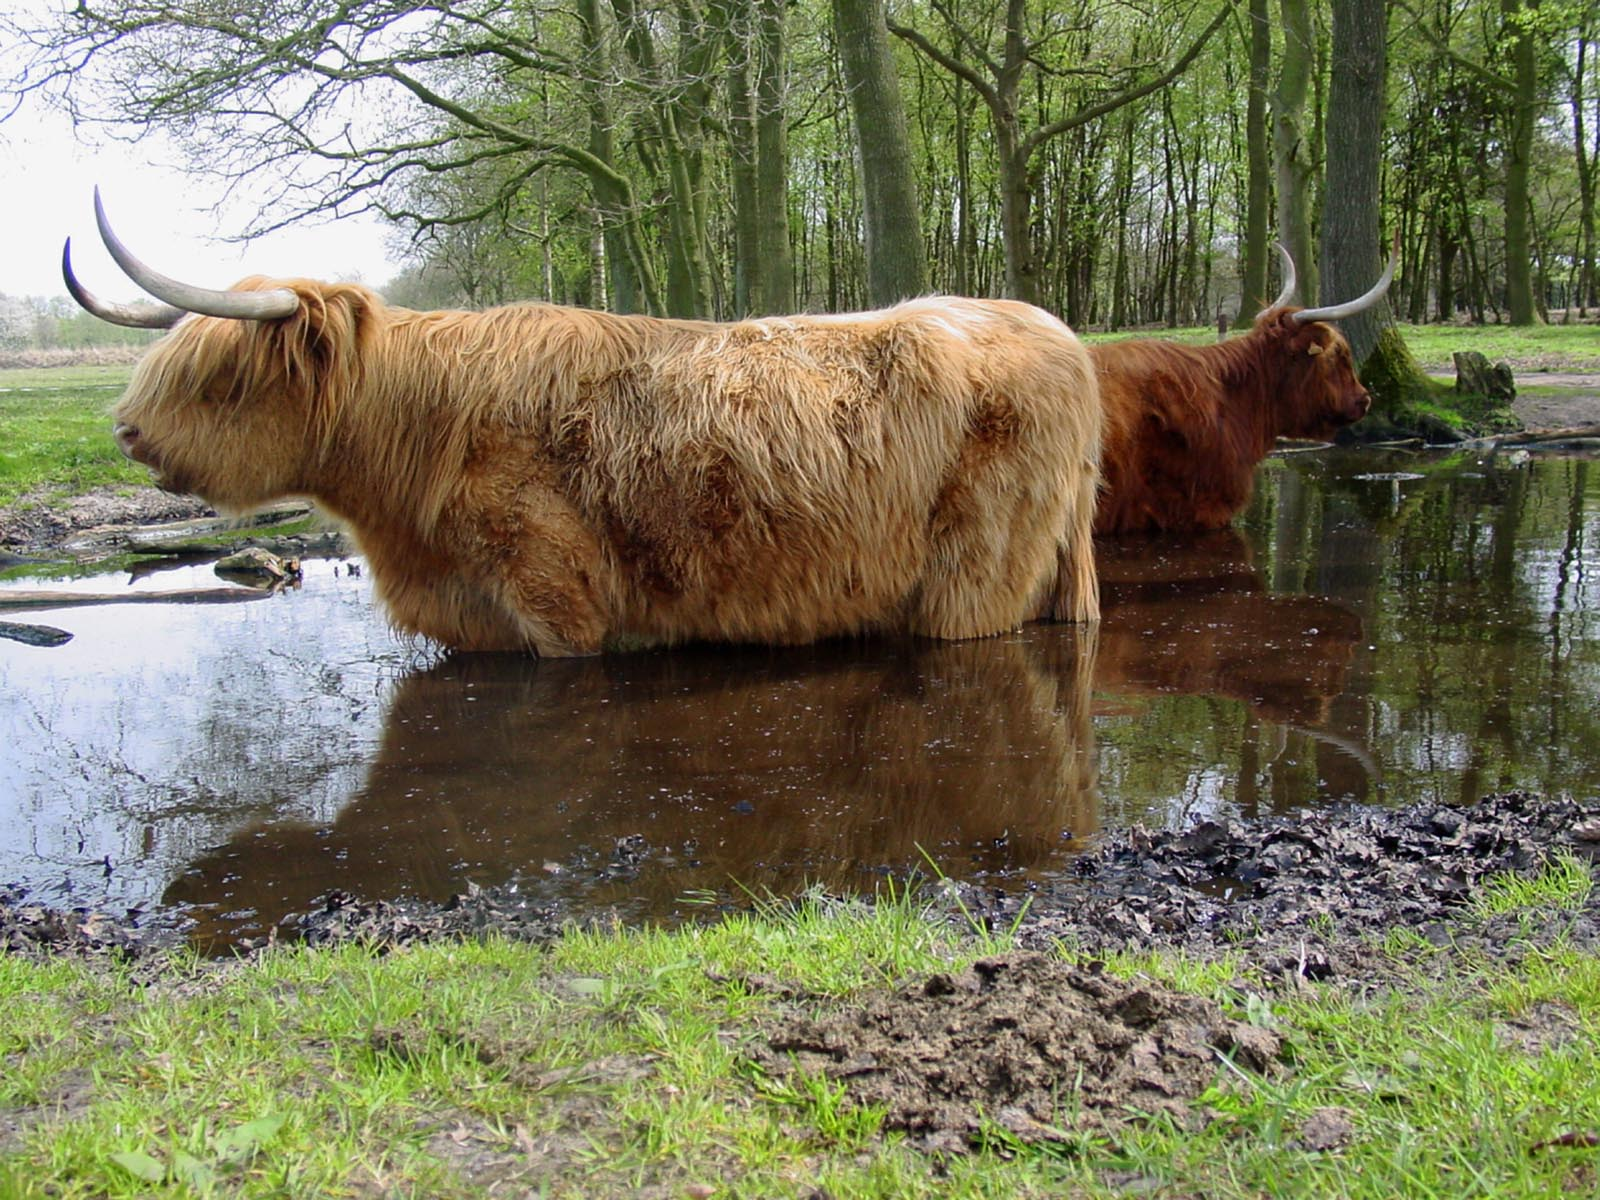 Schotse hooglanders in Ketliker Skar